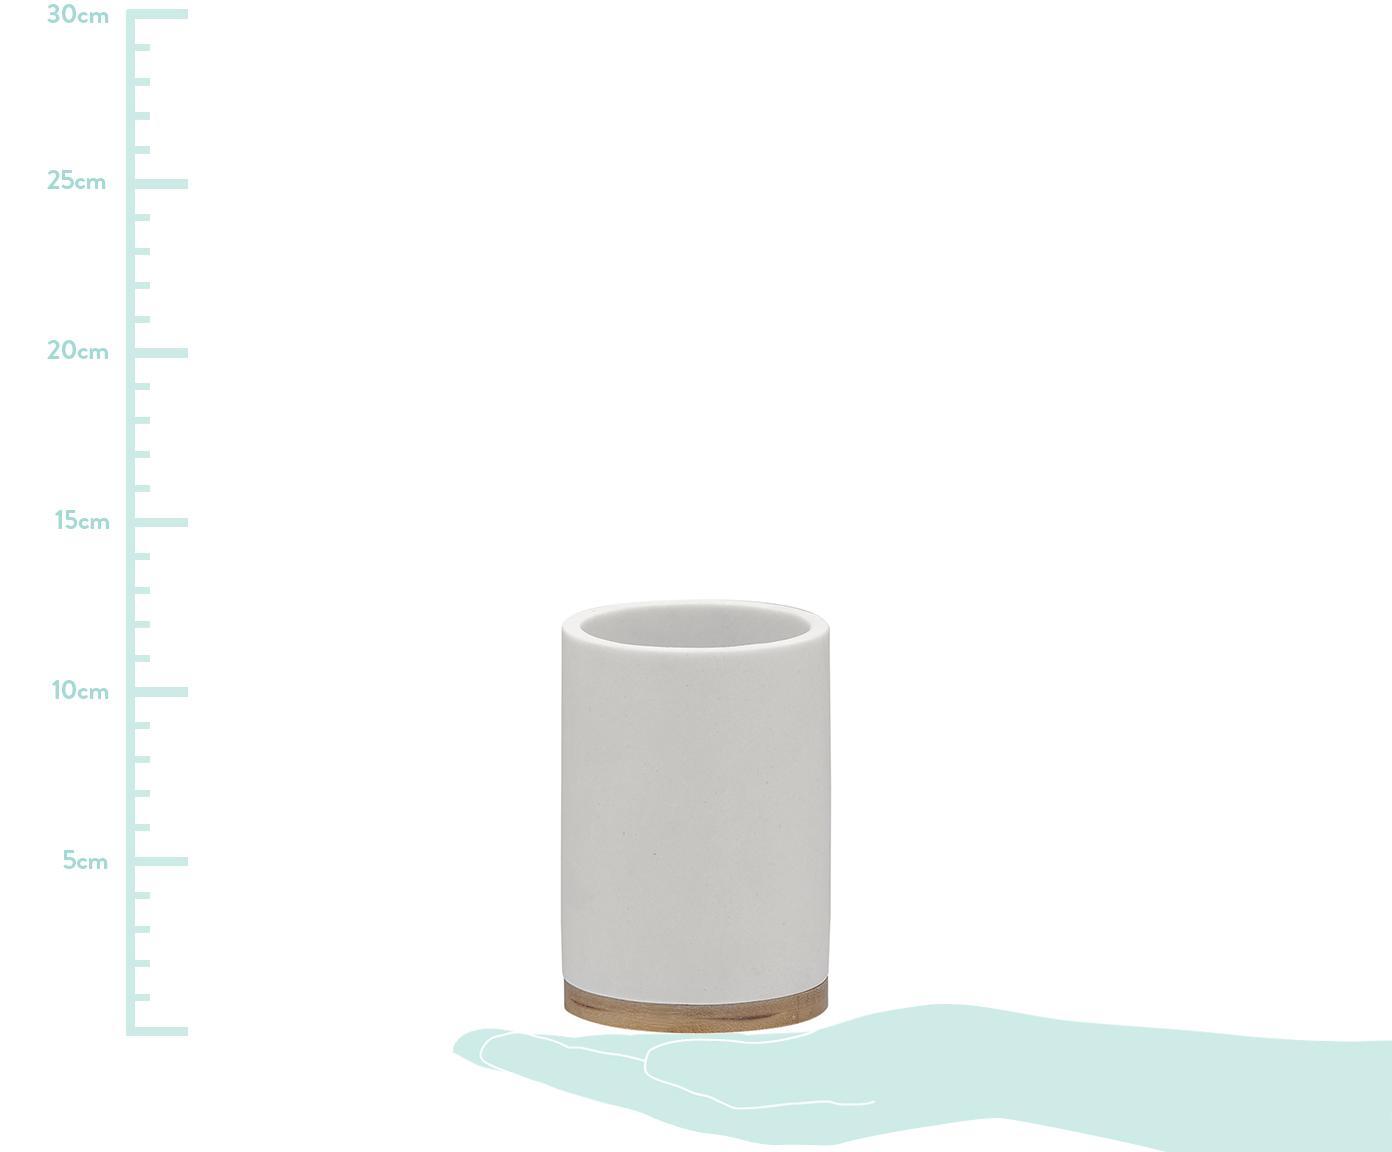 Tandenborstelbeker Grace met bamboehout, Houder: polyresin, Voetstuk: bamboehout, Wit, Ø 7 x H 11 cm